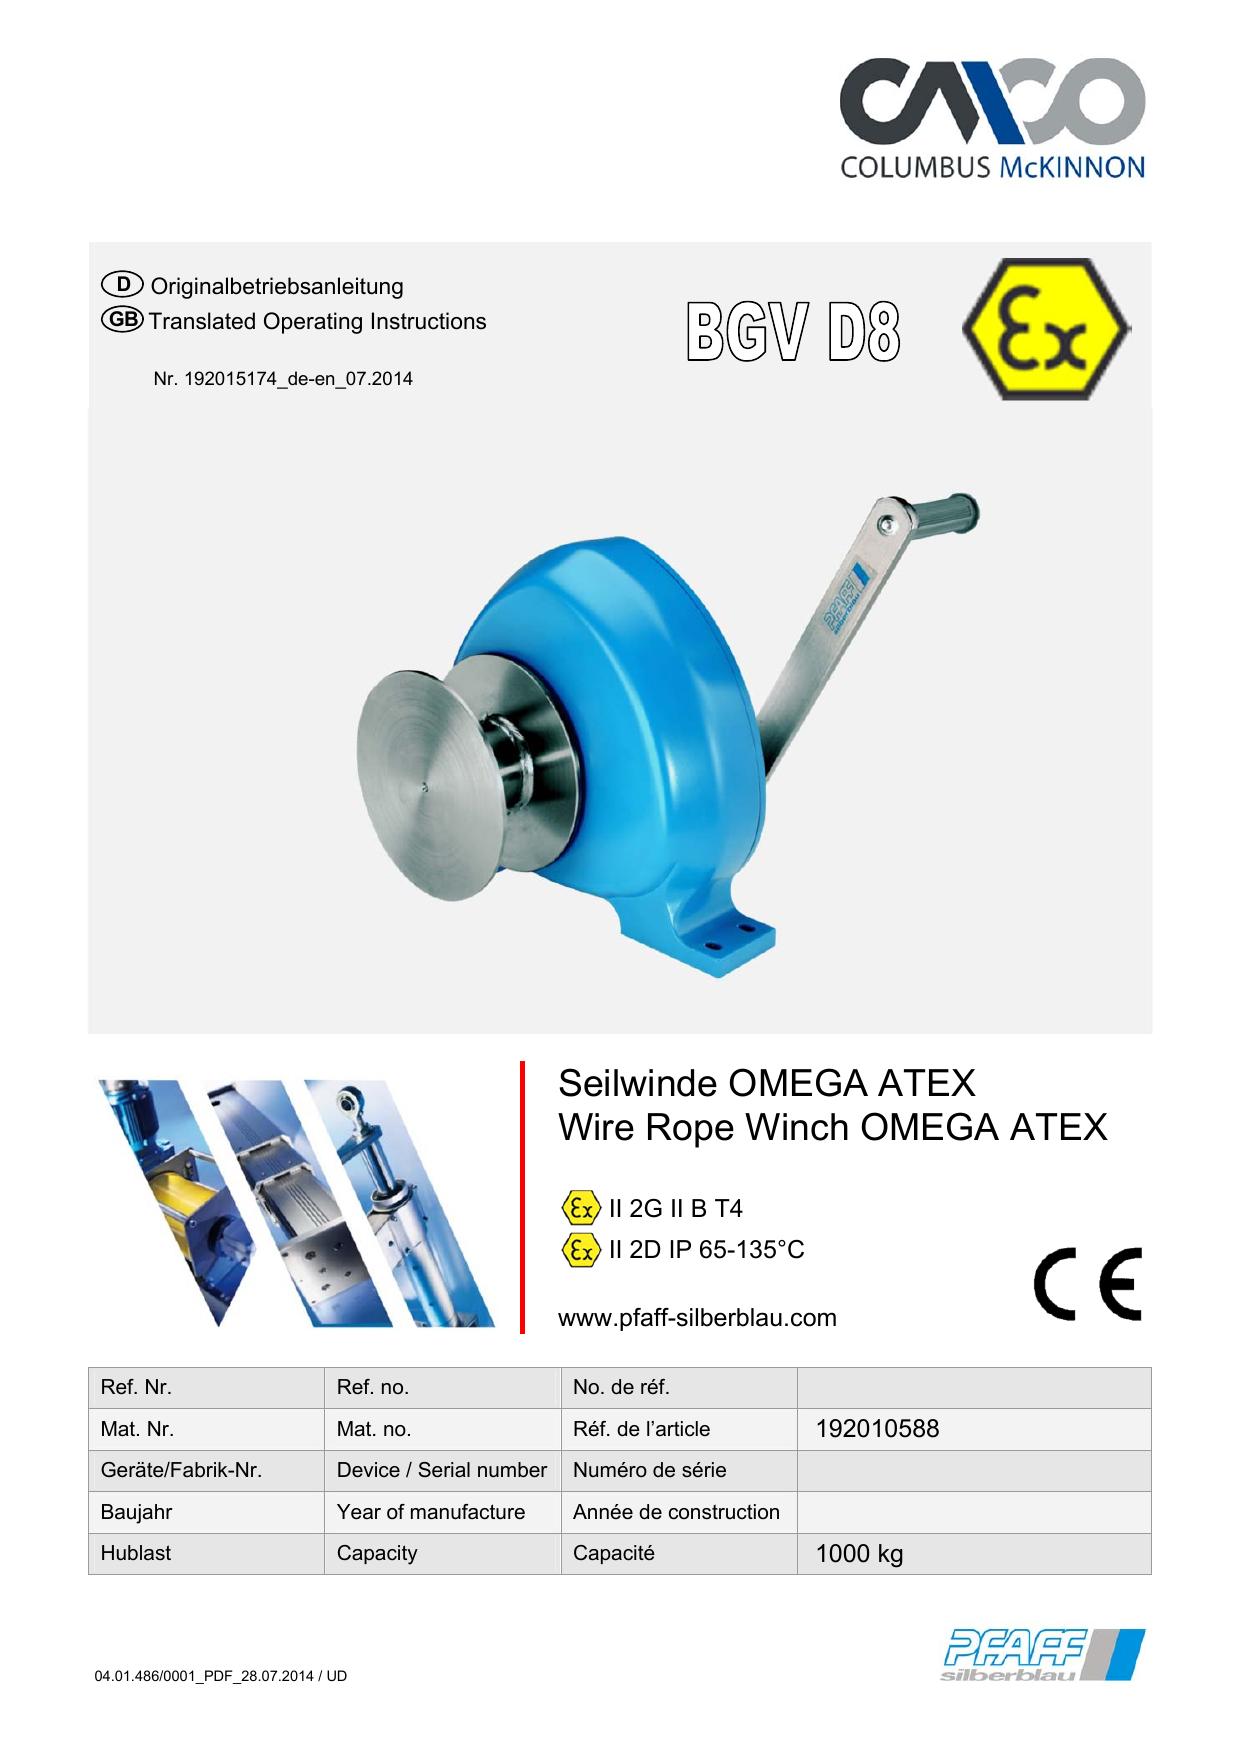 Seilwinde OMEGA ATEX Wire Rope Winch   Pfaff   Manualzz